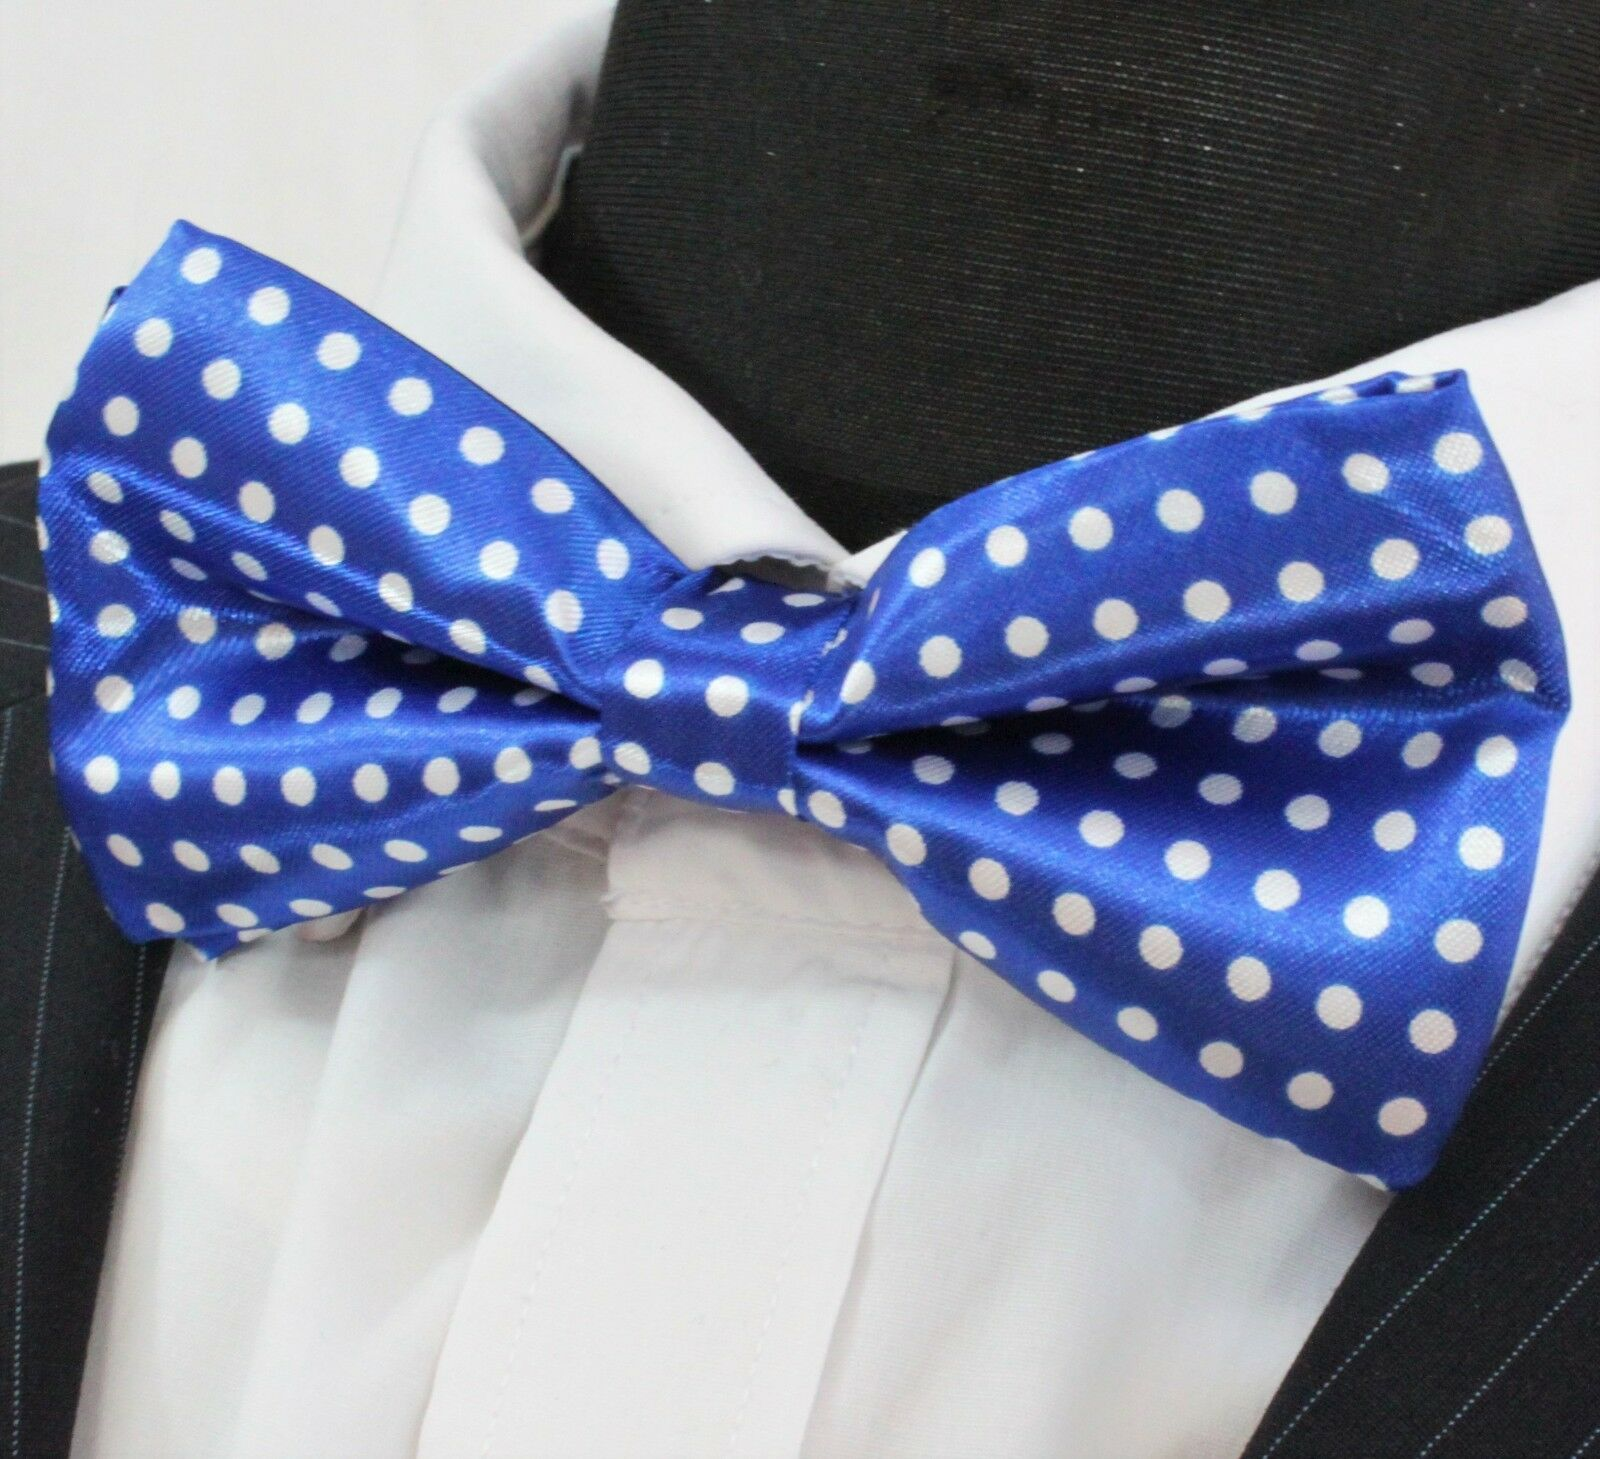 Bow Tie. Bright Blue with White Polka Dot. Premium Quality. Pre-Tied. YT09